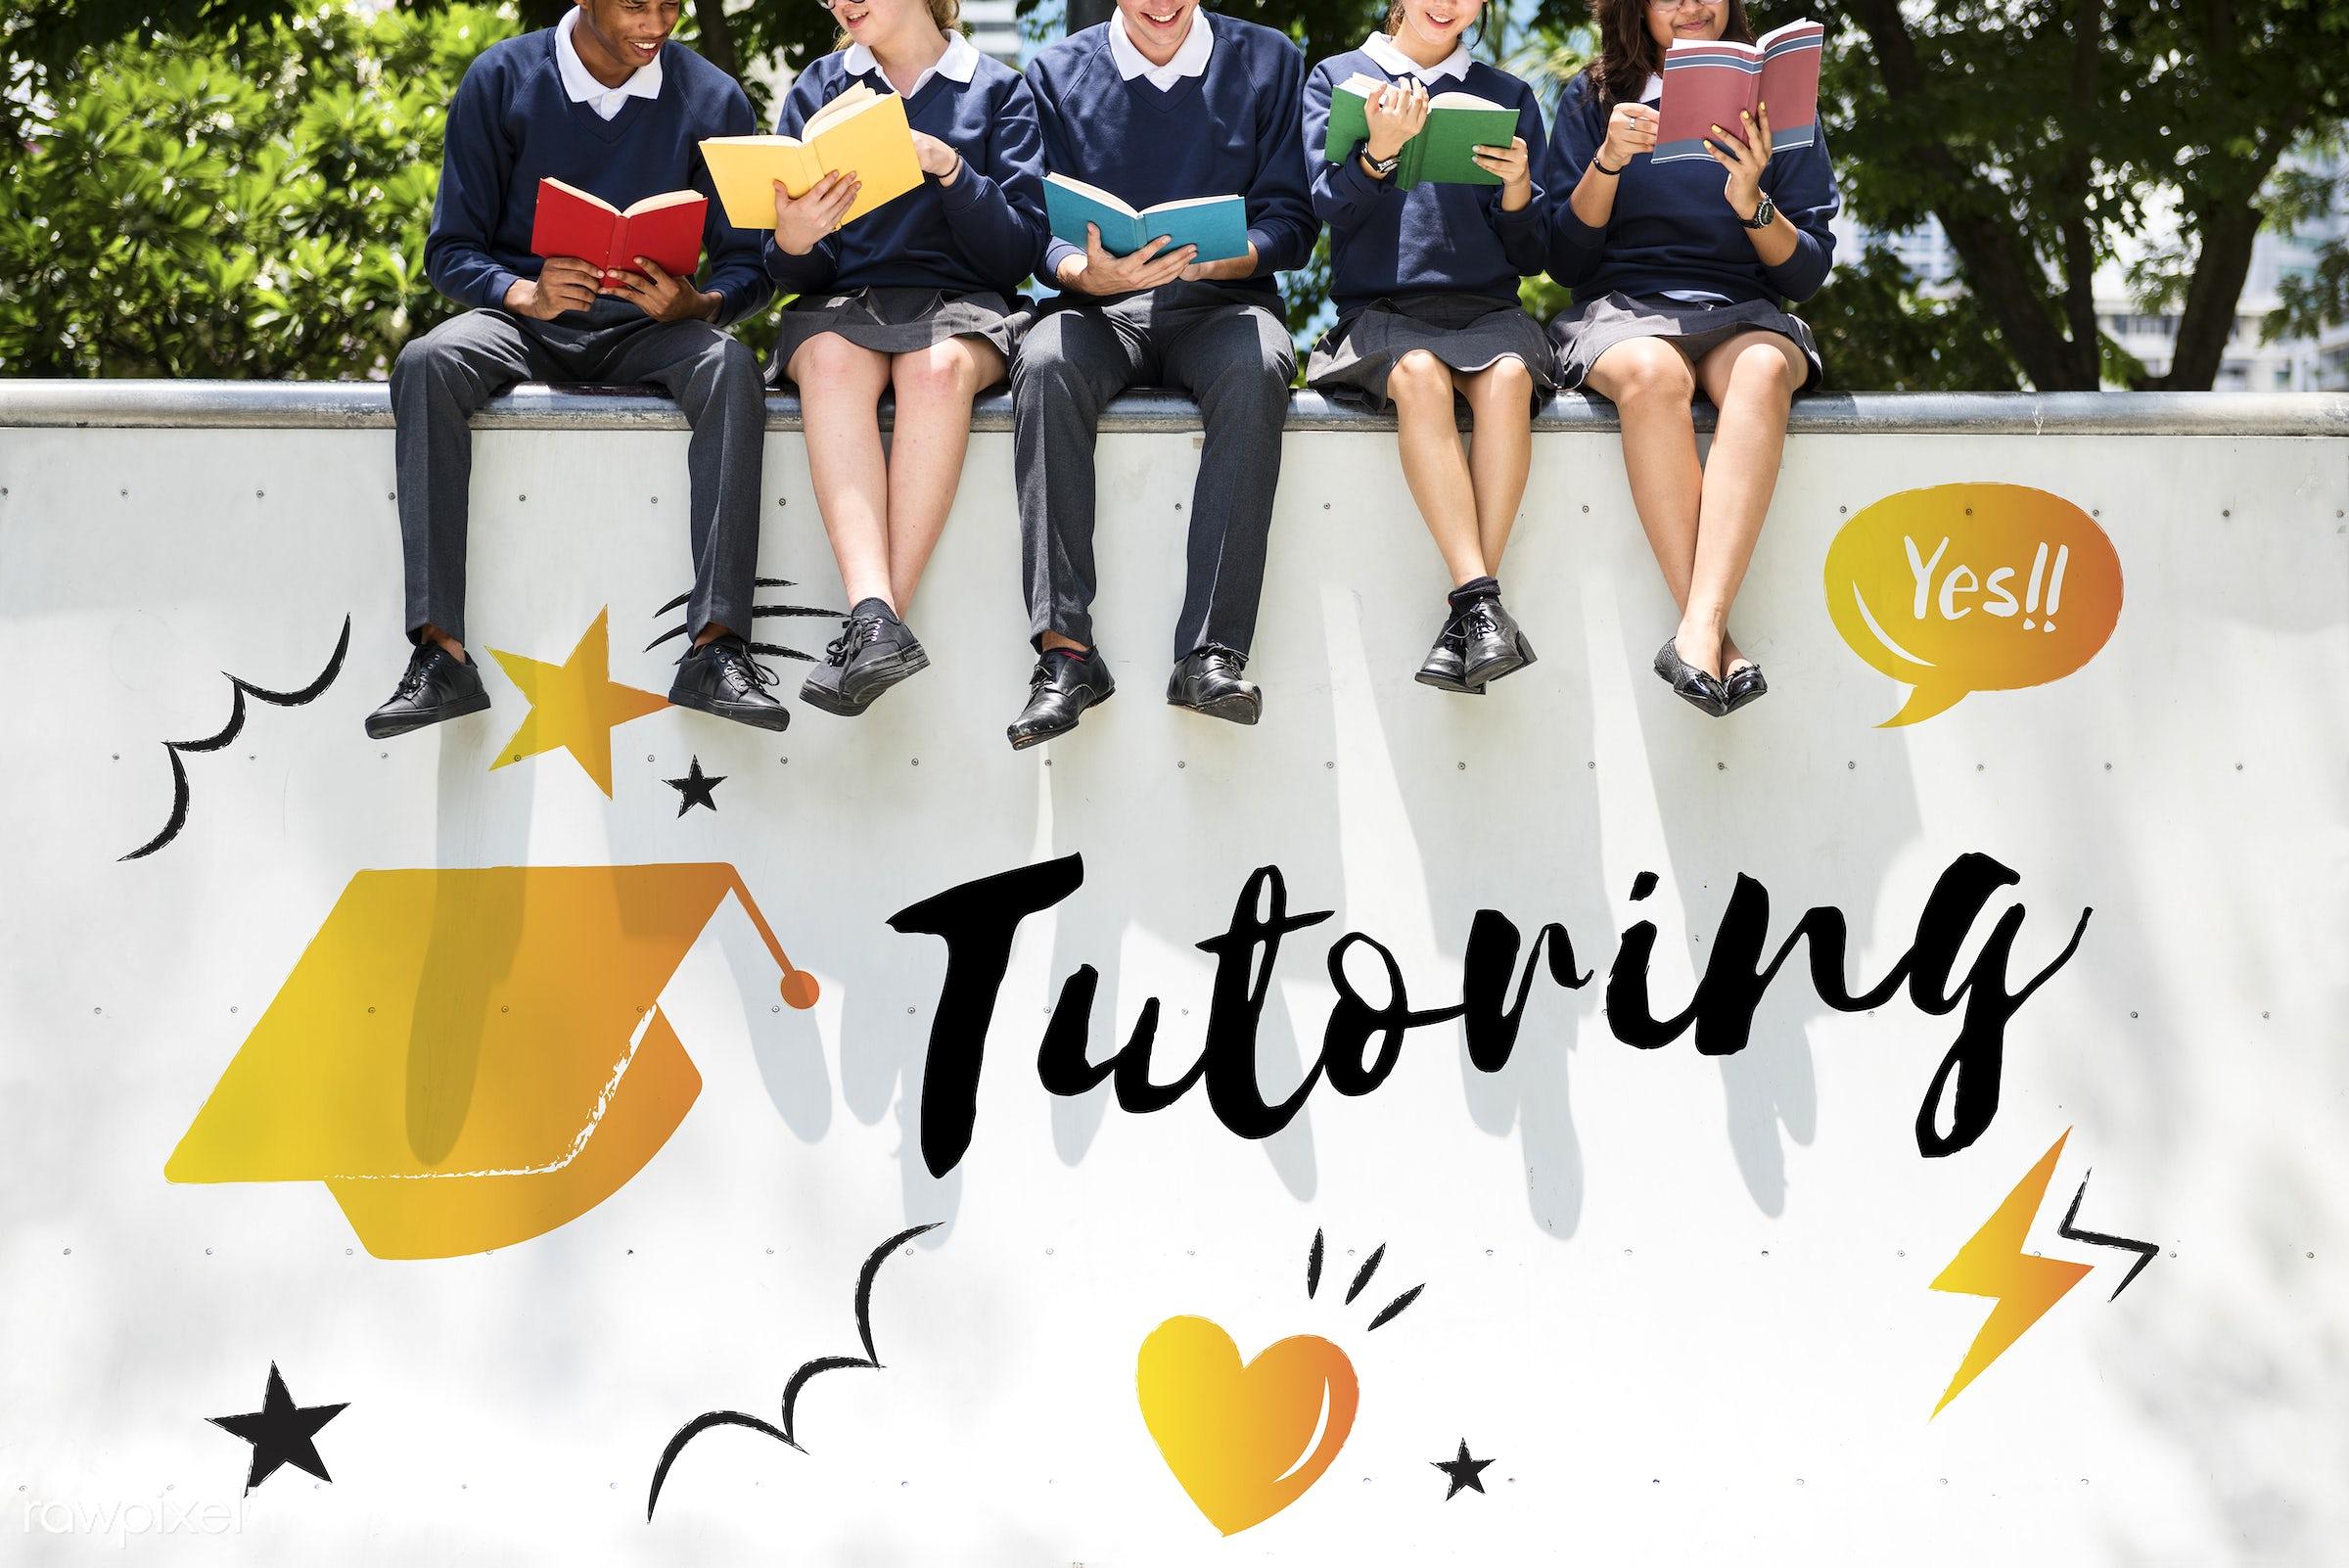 academics, books, cap, class, college, diversity, education, friends, friendship, graduation, graphic, high school, holding...